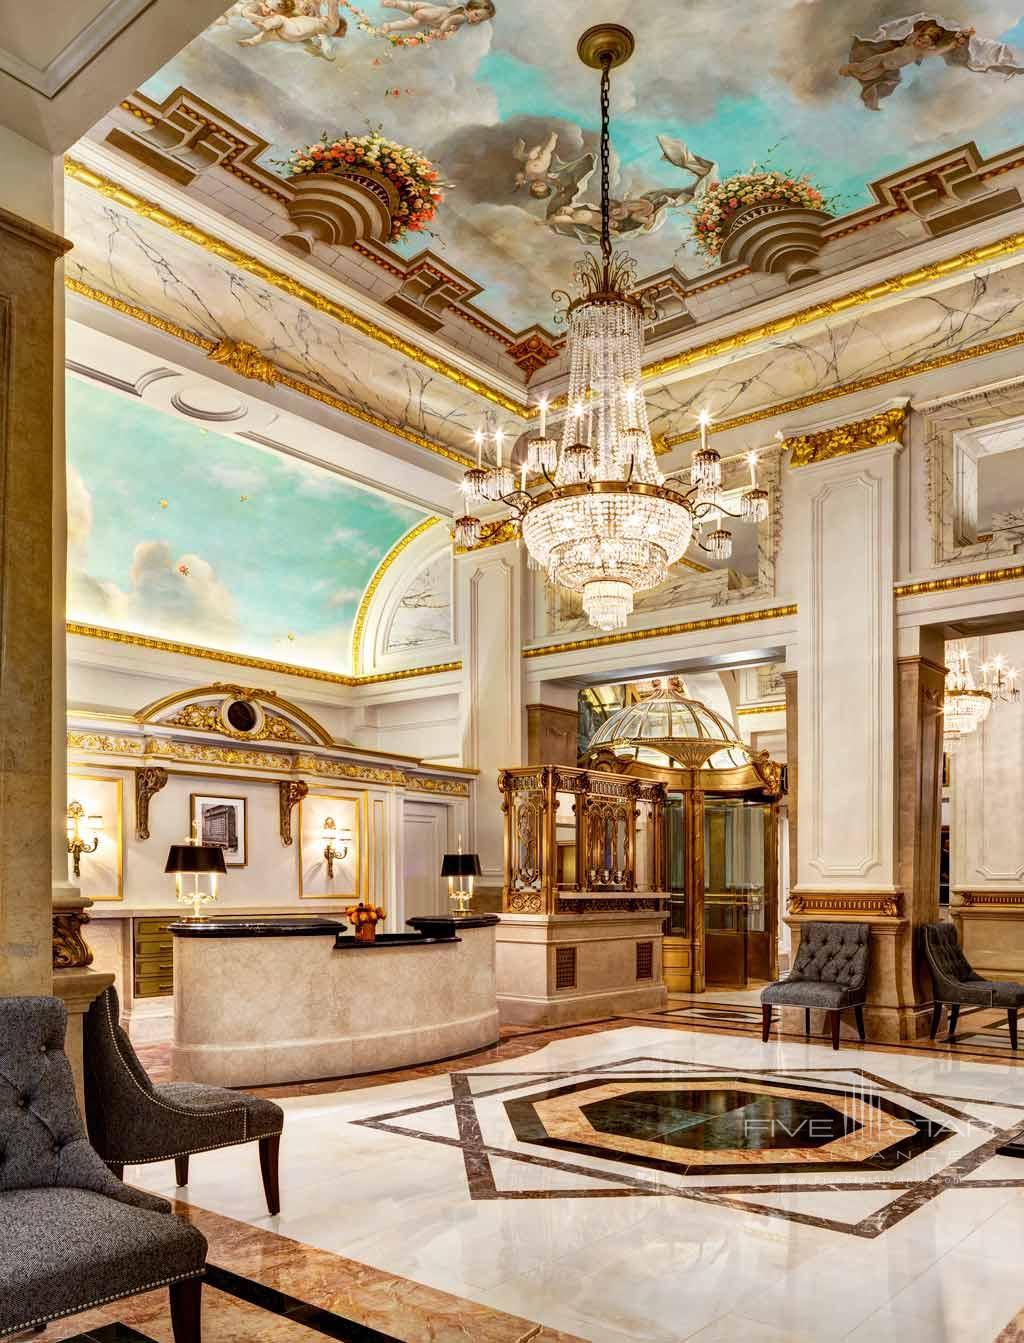 Lobby of The St Regis New York, NY, United States